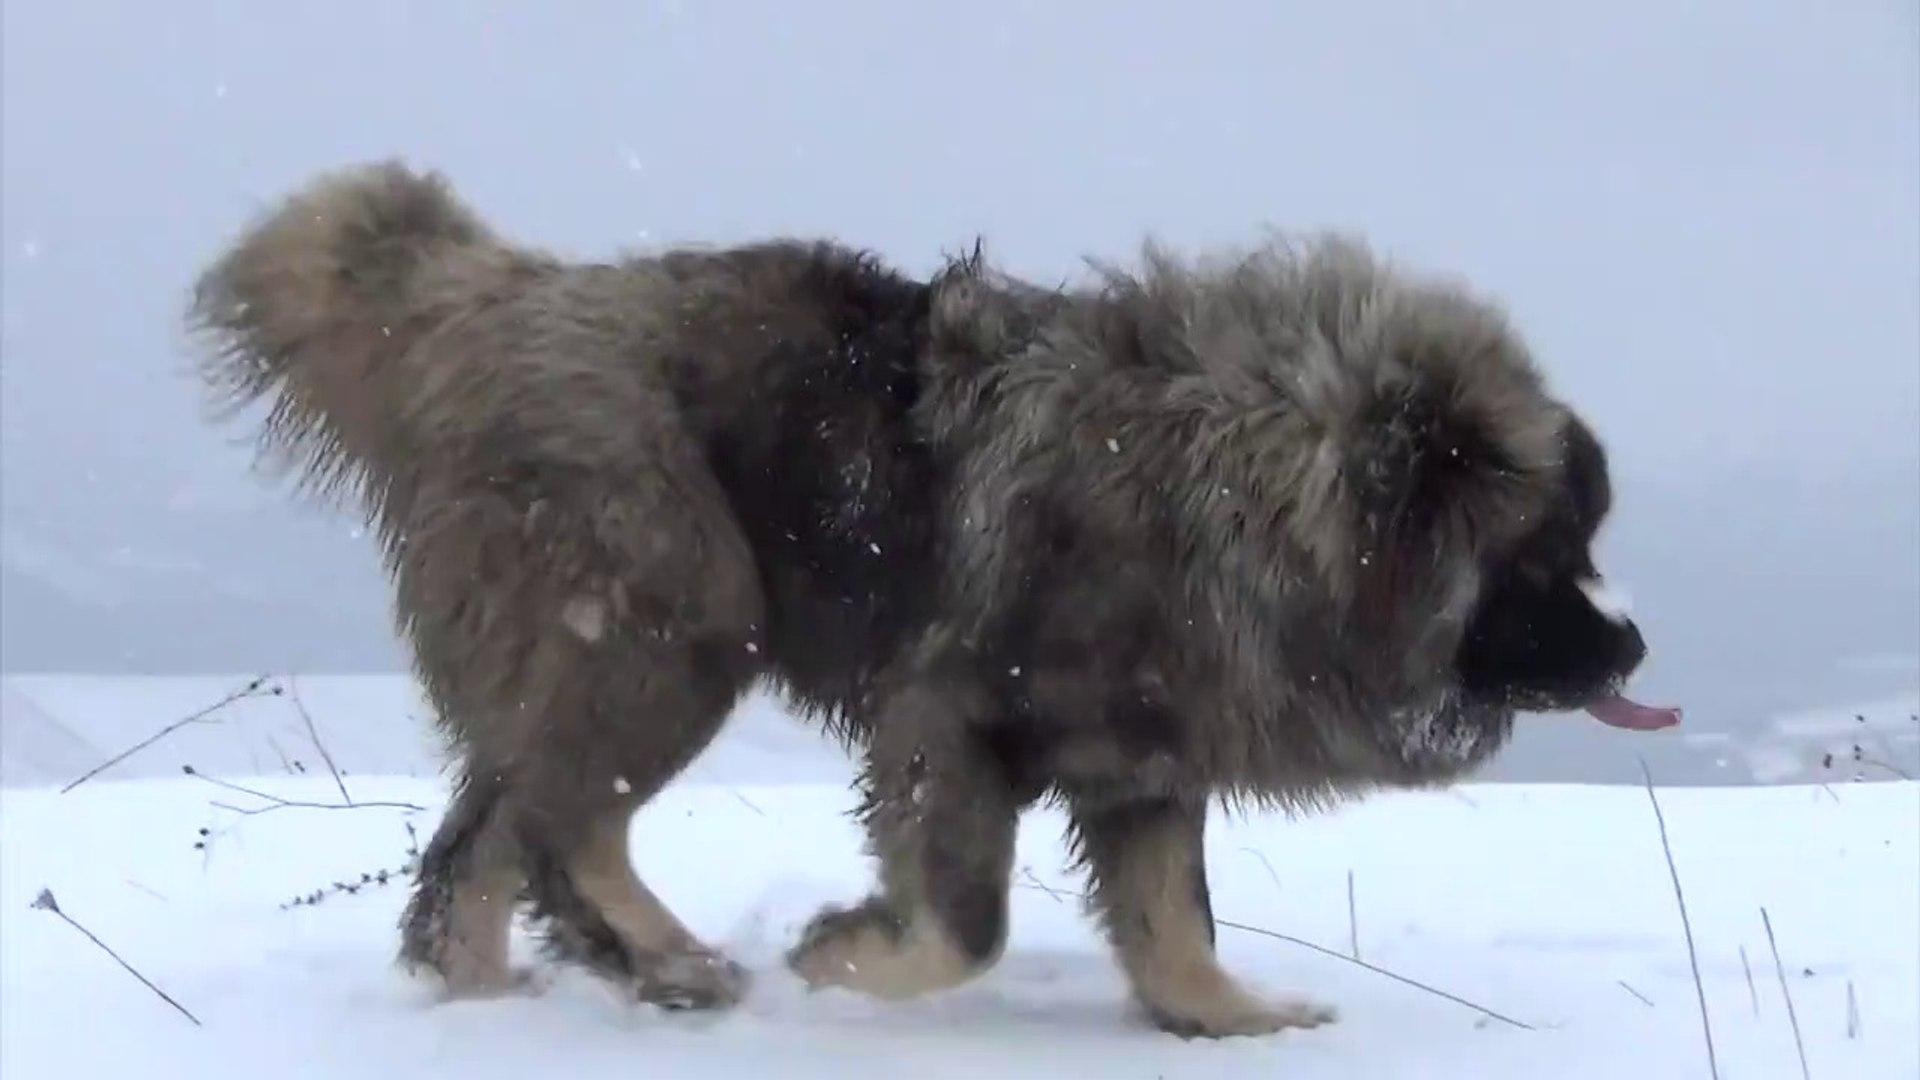 BAKIMLI VE DEGERLi KAFKAS COBAN KOPEGi - VERY WELL MAiNTAiNED CAUCASiAN SHEPHERD DOG